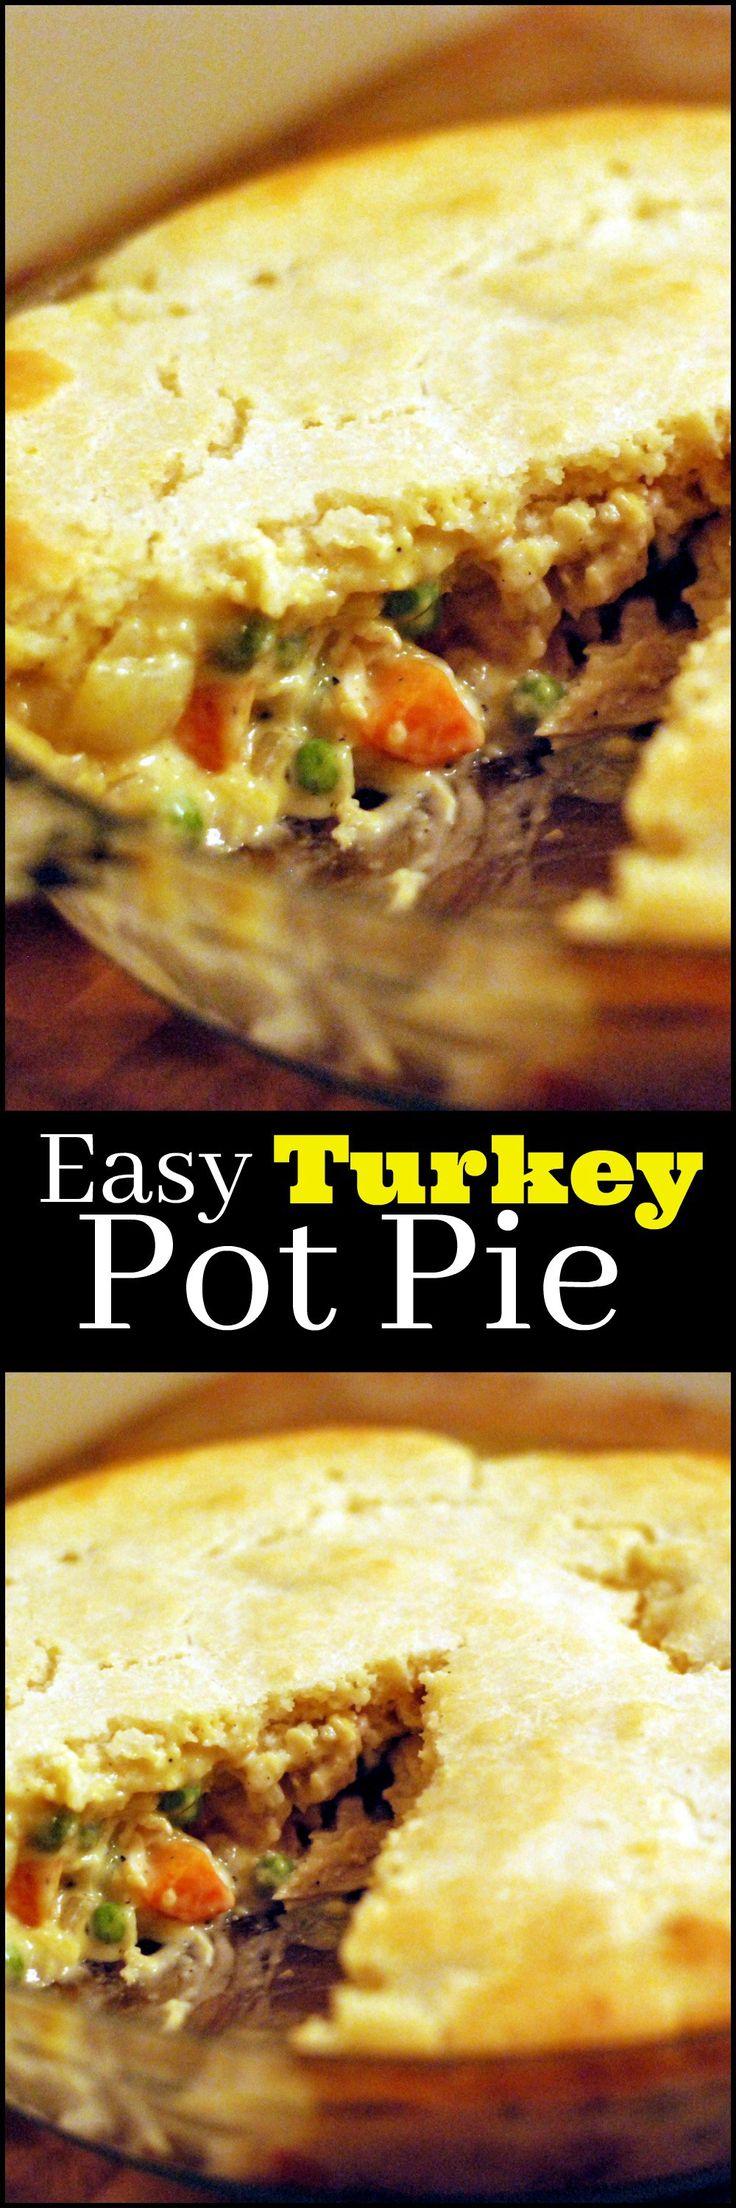 Easy Turkey Pot Pie | Aunt Bee's Recipes